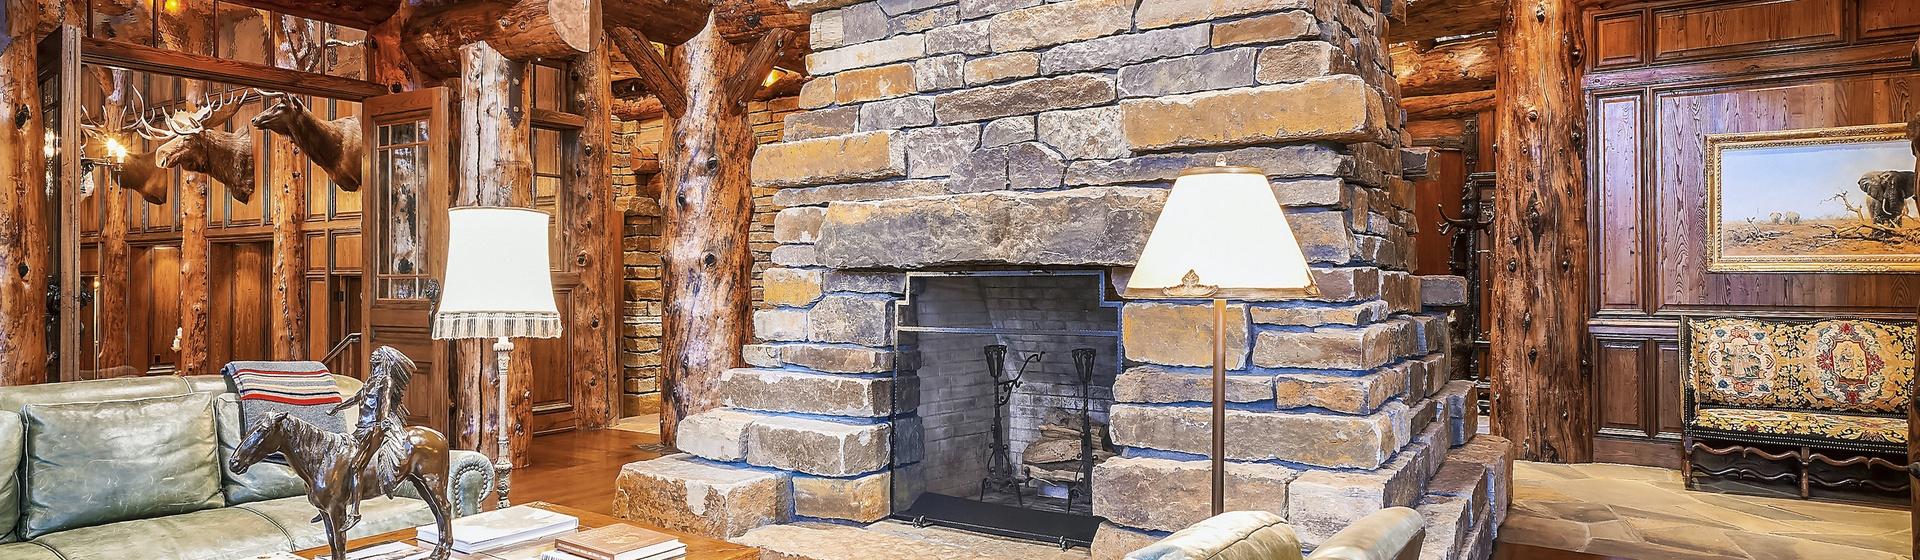 1.5-Telluride-Sleeping-Indian-Ranch-living-room-fireplace-4-web.JPG